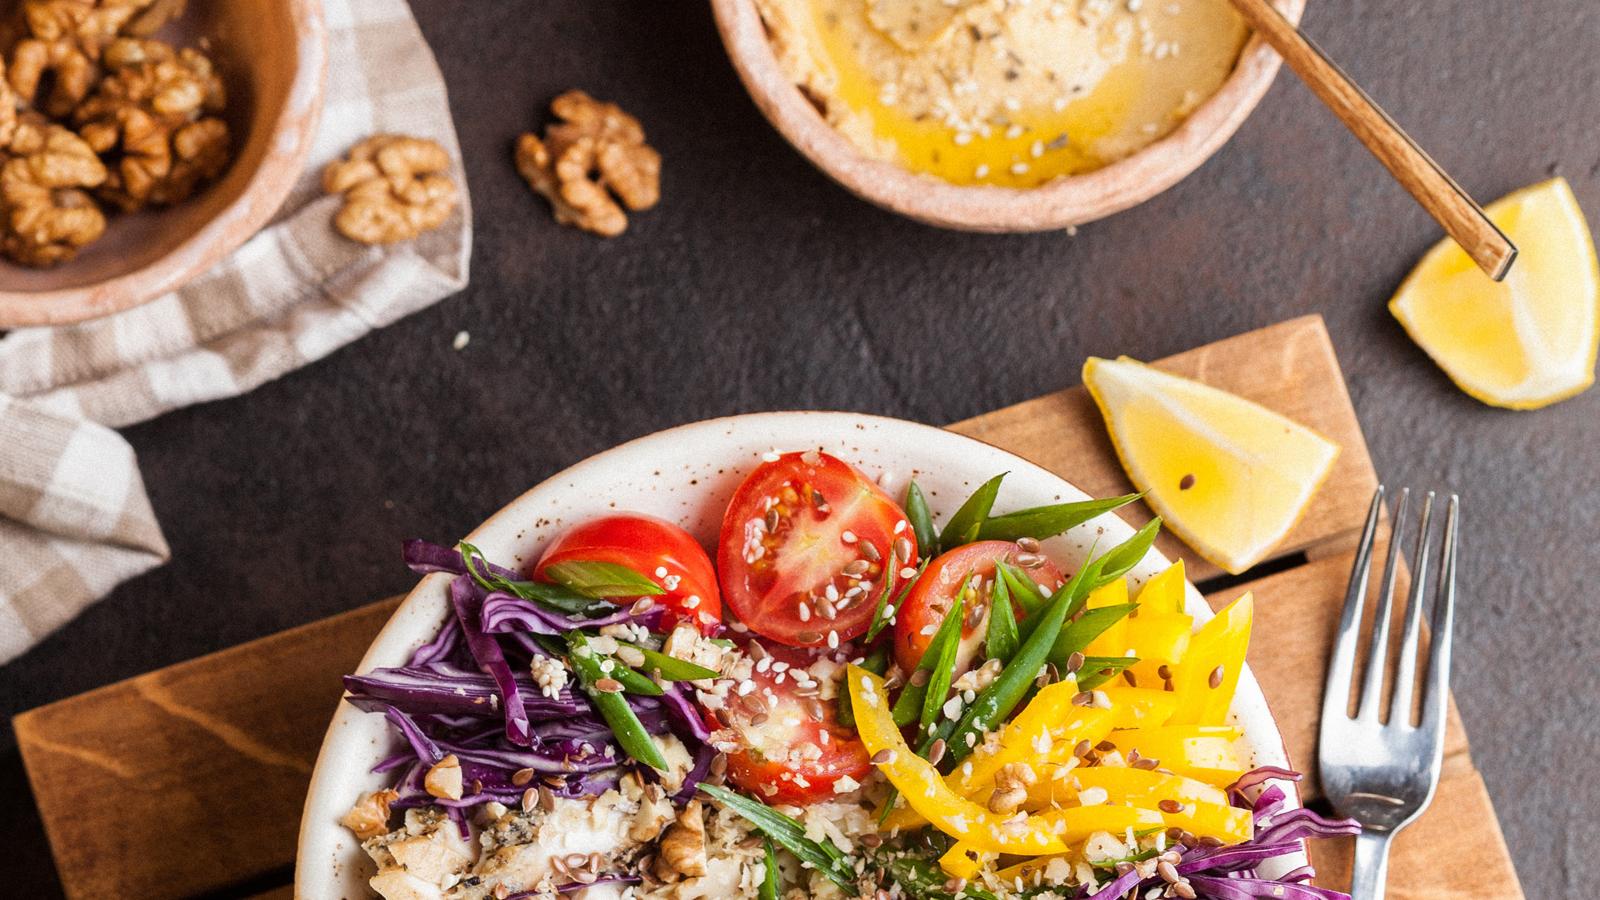 Salad dressing ideas